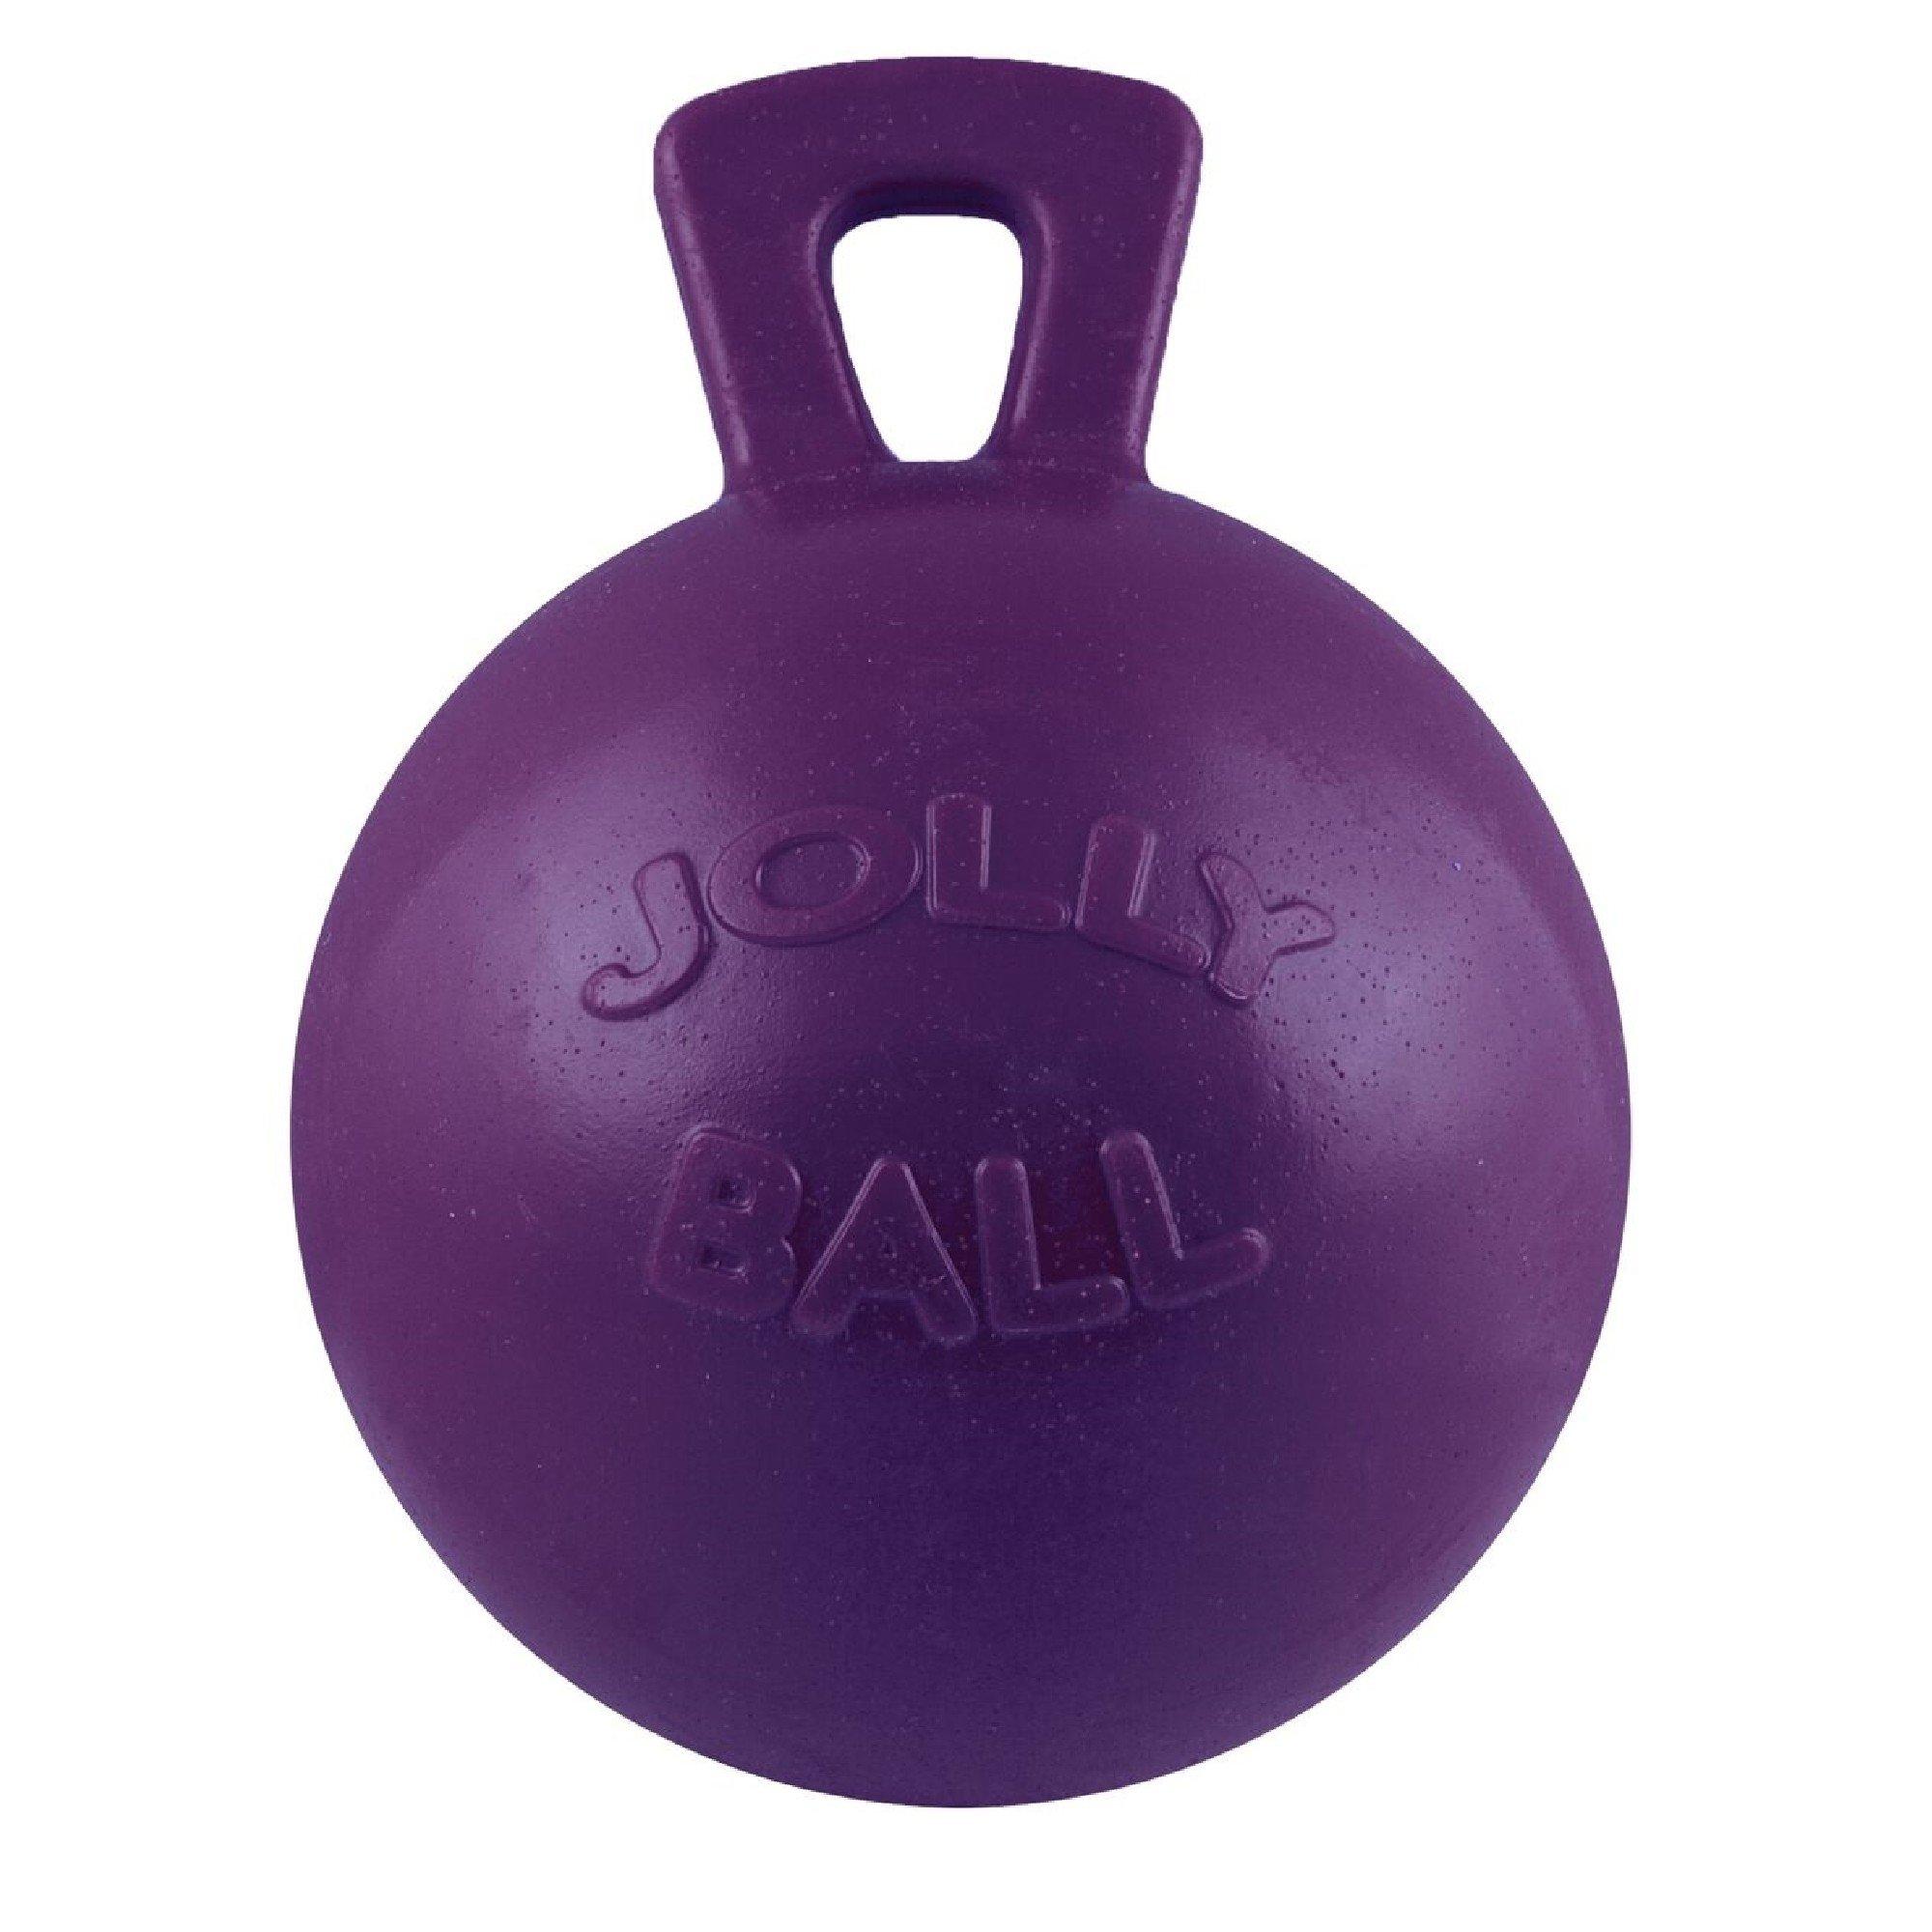 Horsemens Pride Jolly Ball (10 inches) (Purple)